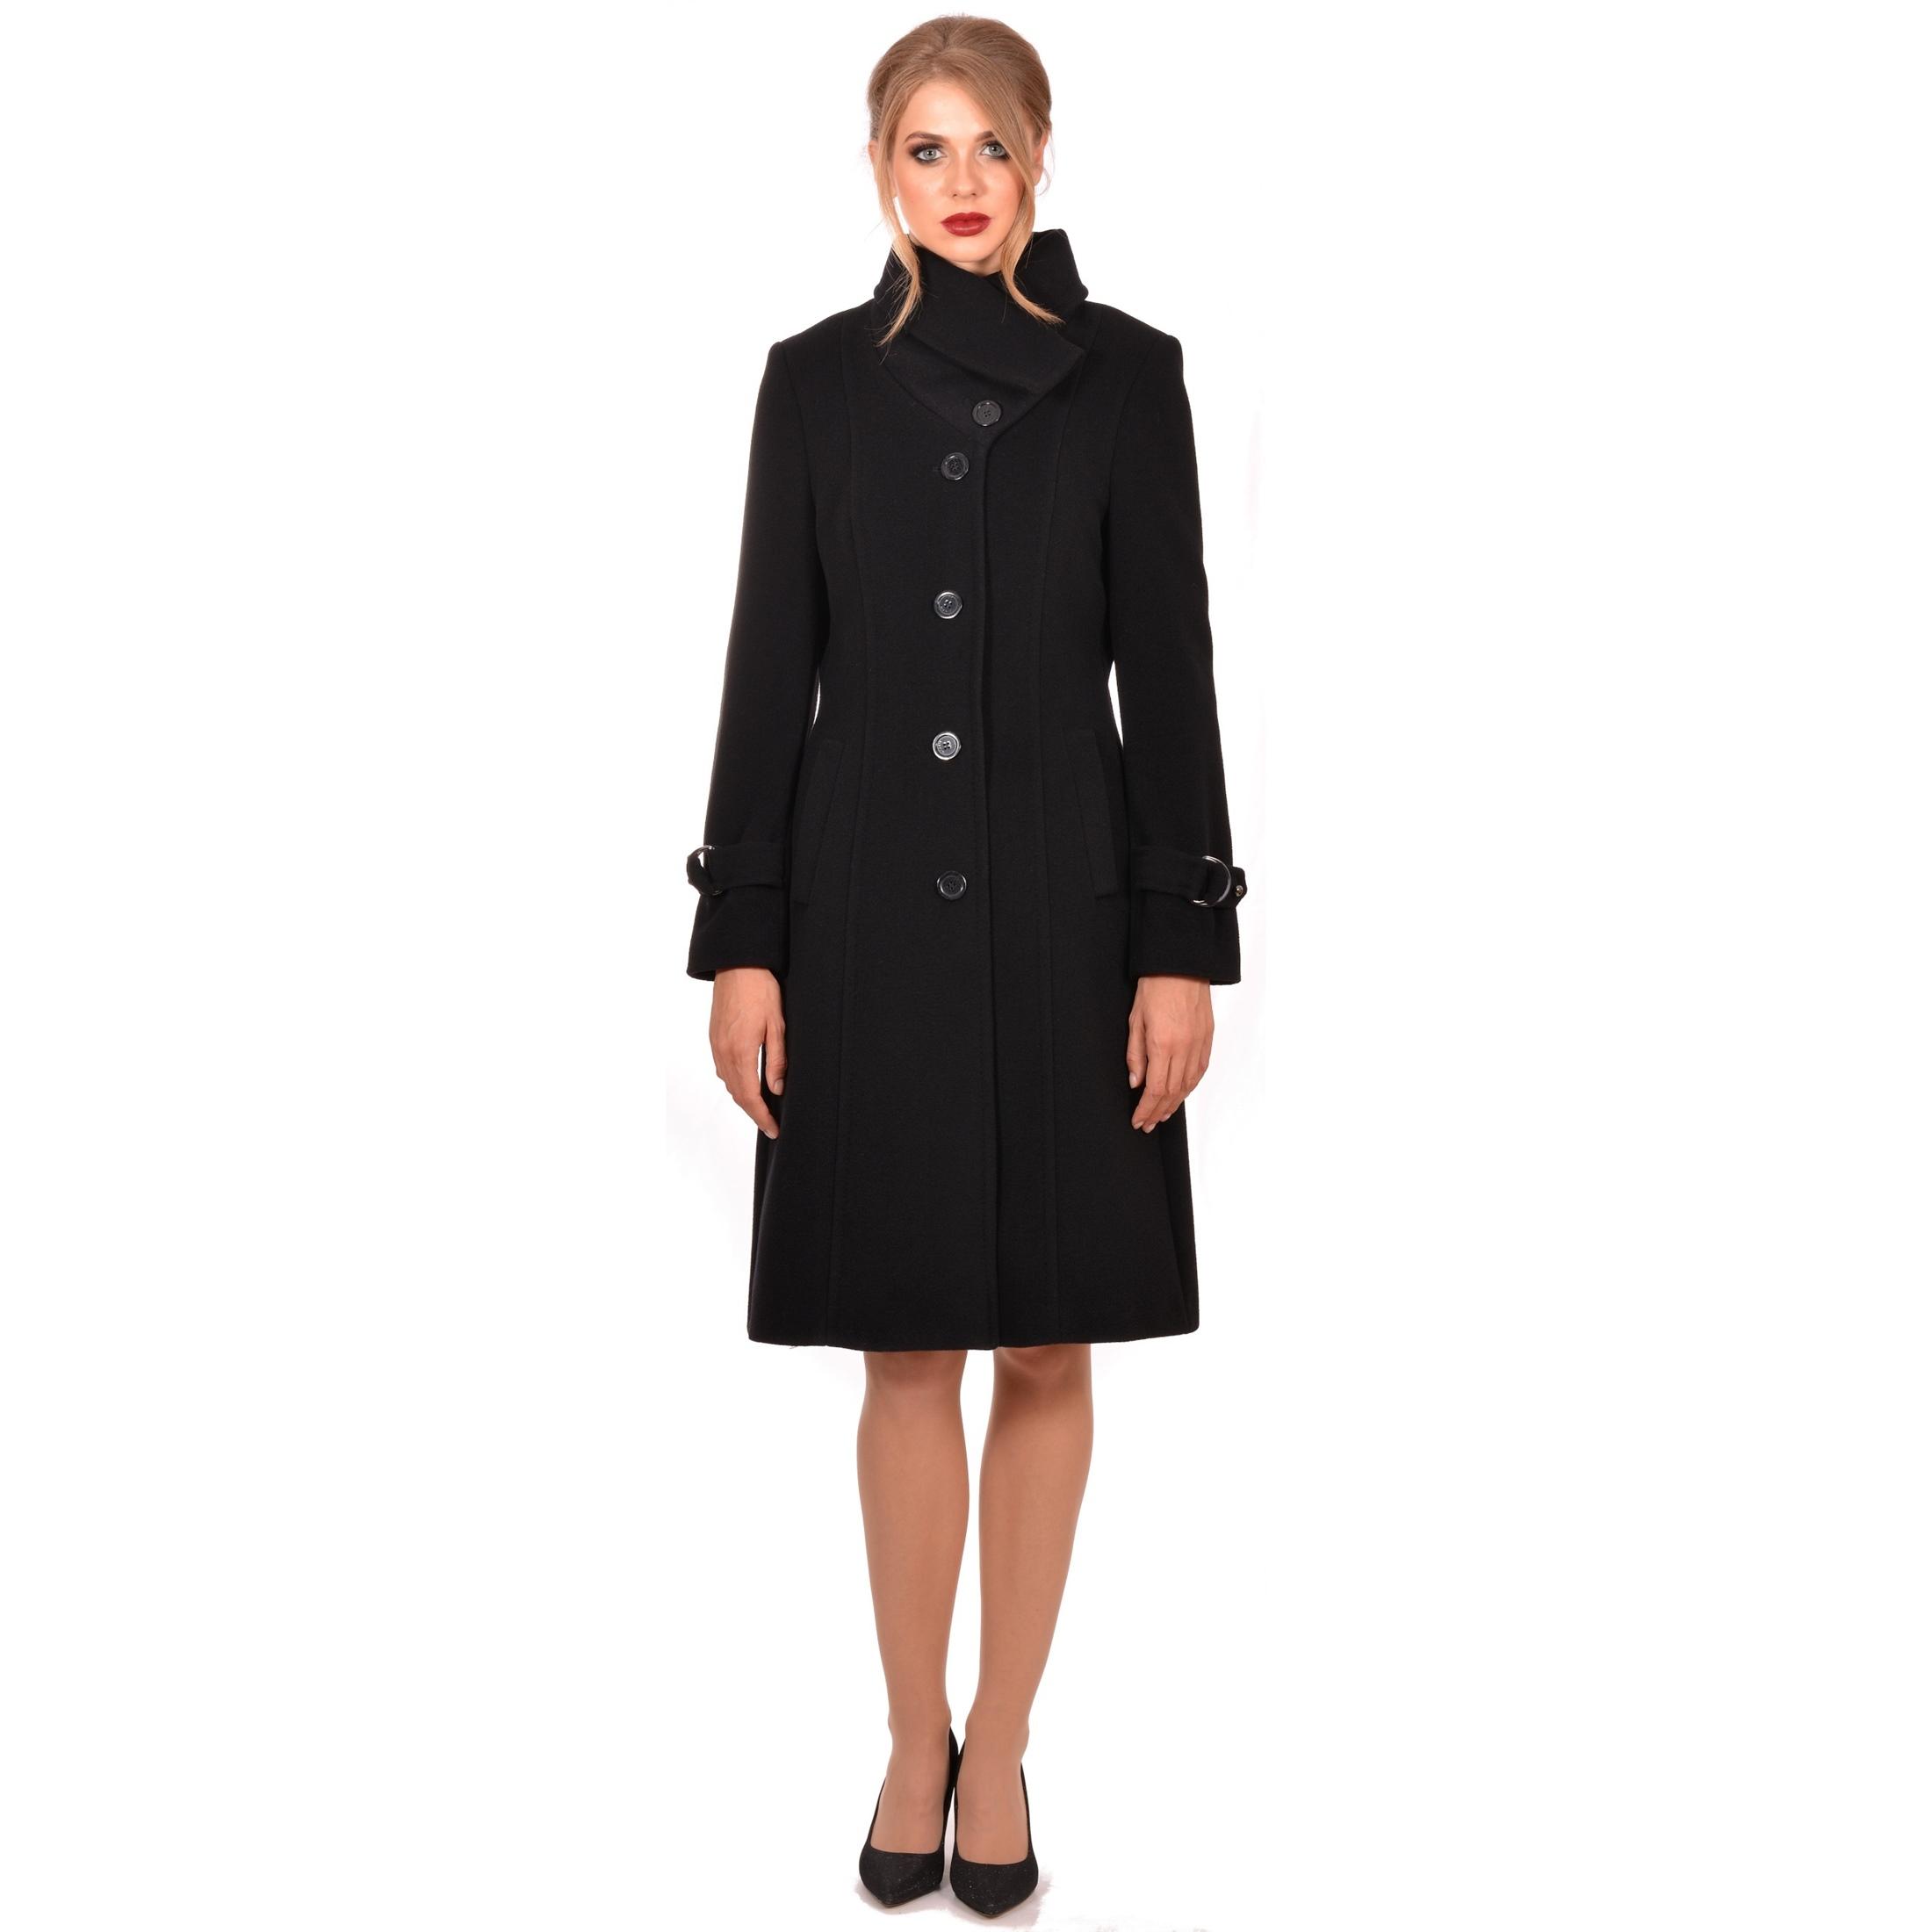 ženski crni kaput lady m,women's coat lady m by maria fashion